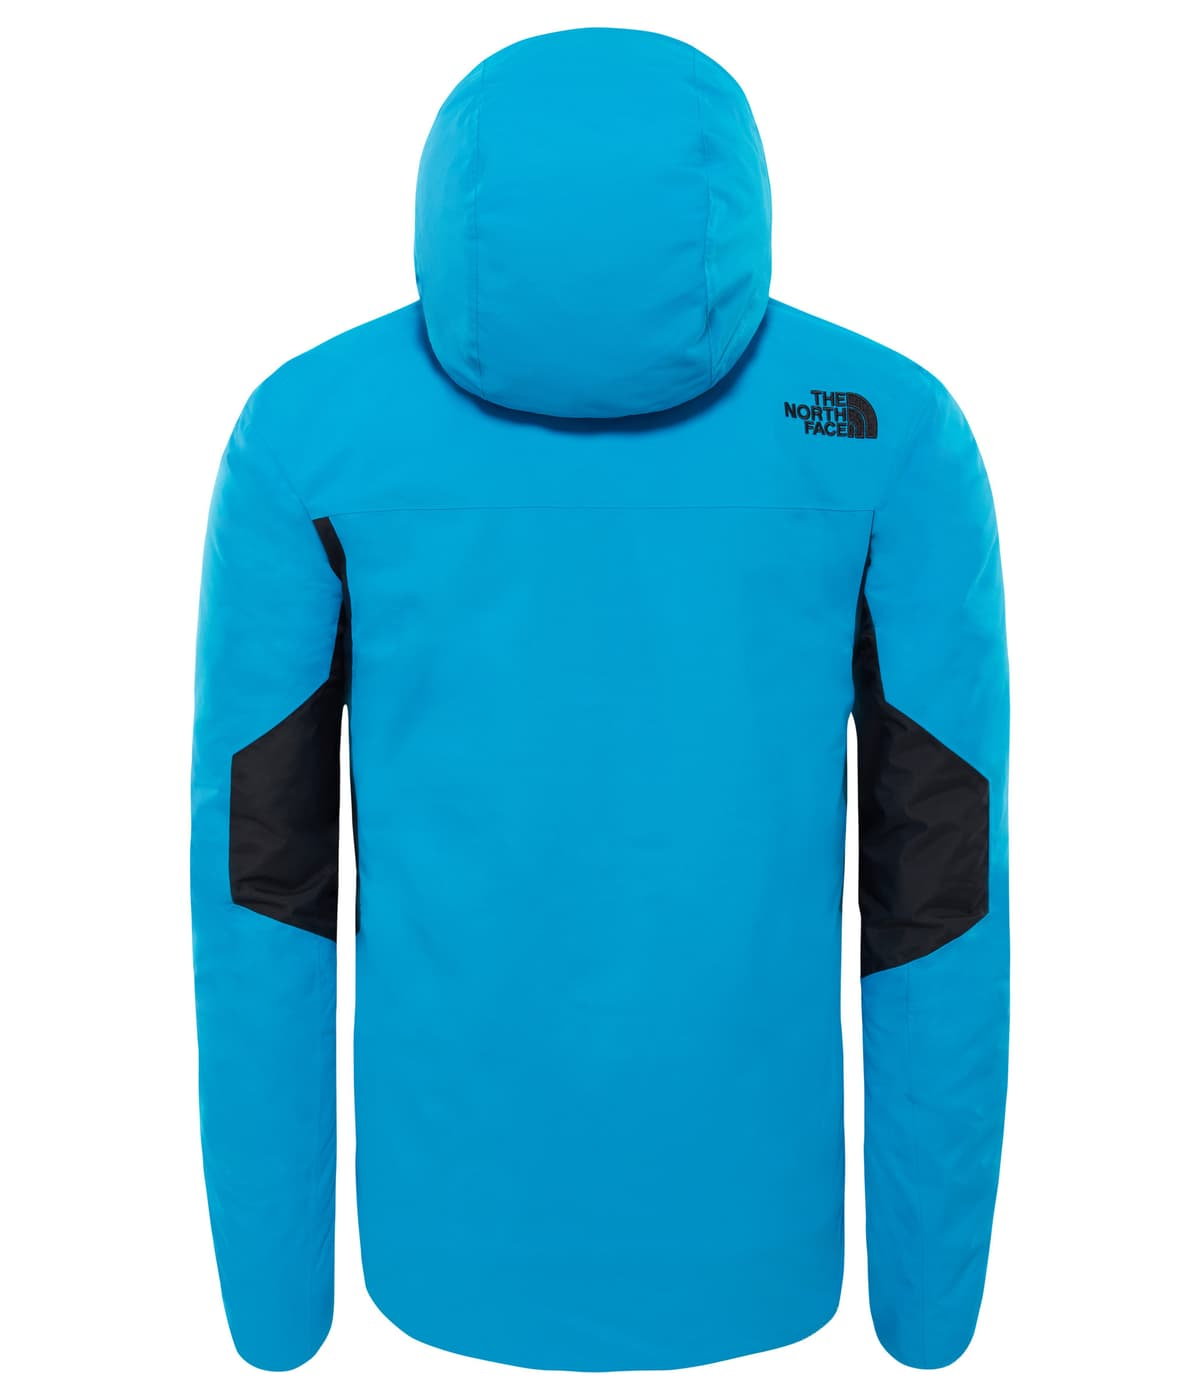 ... The North Face Clement Triclimate Jacket Giacca da sci da donna ... f97a17e688d0